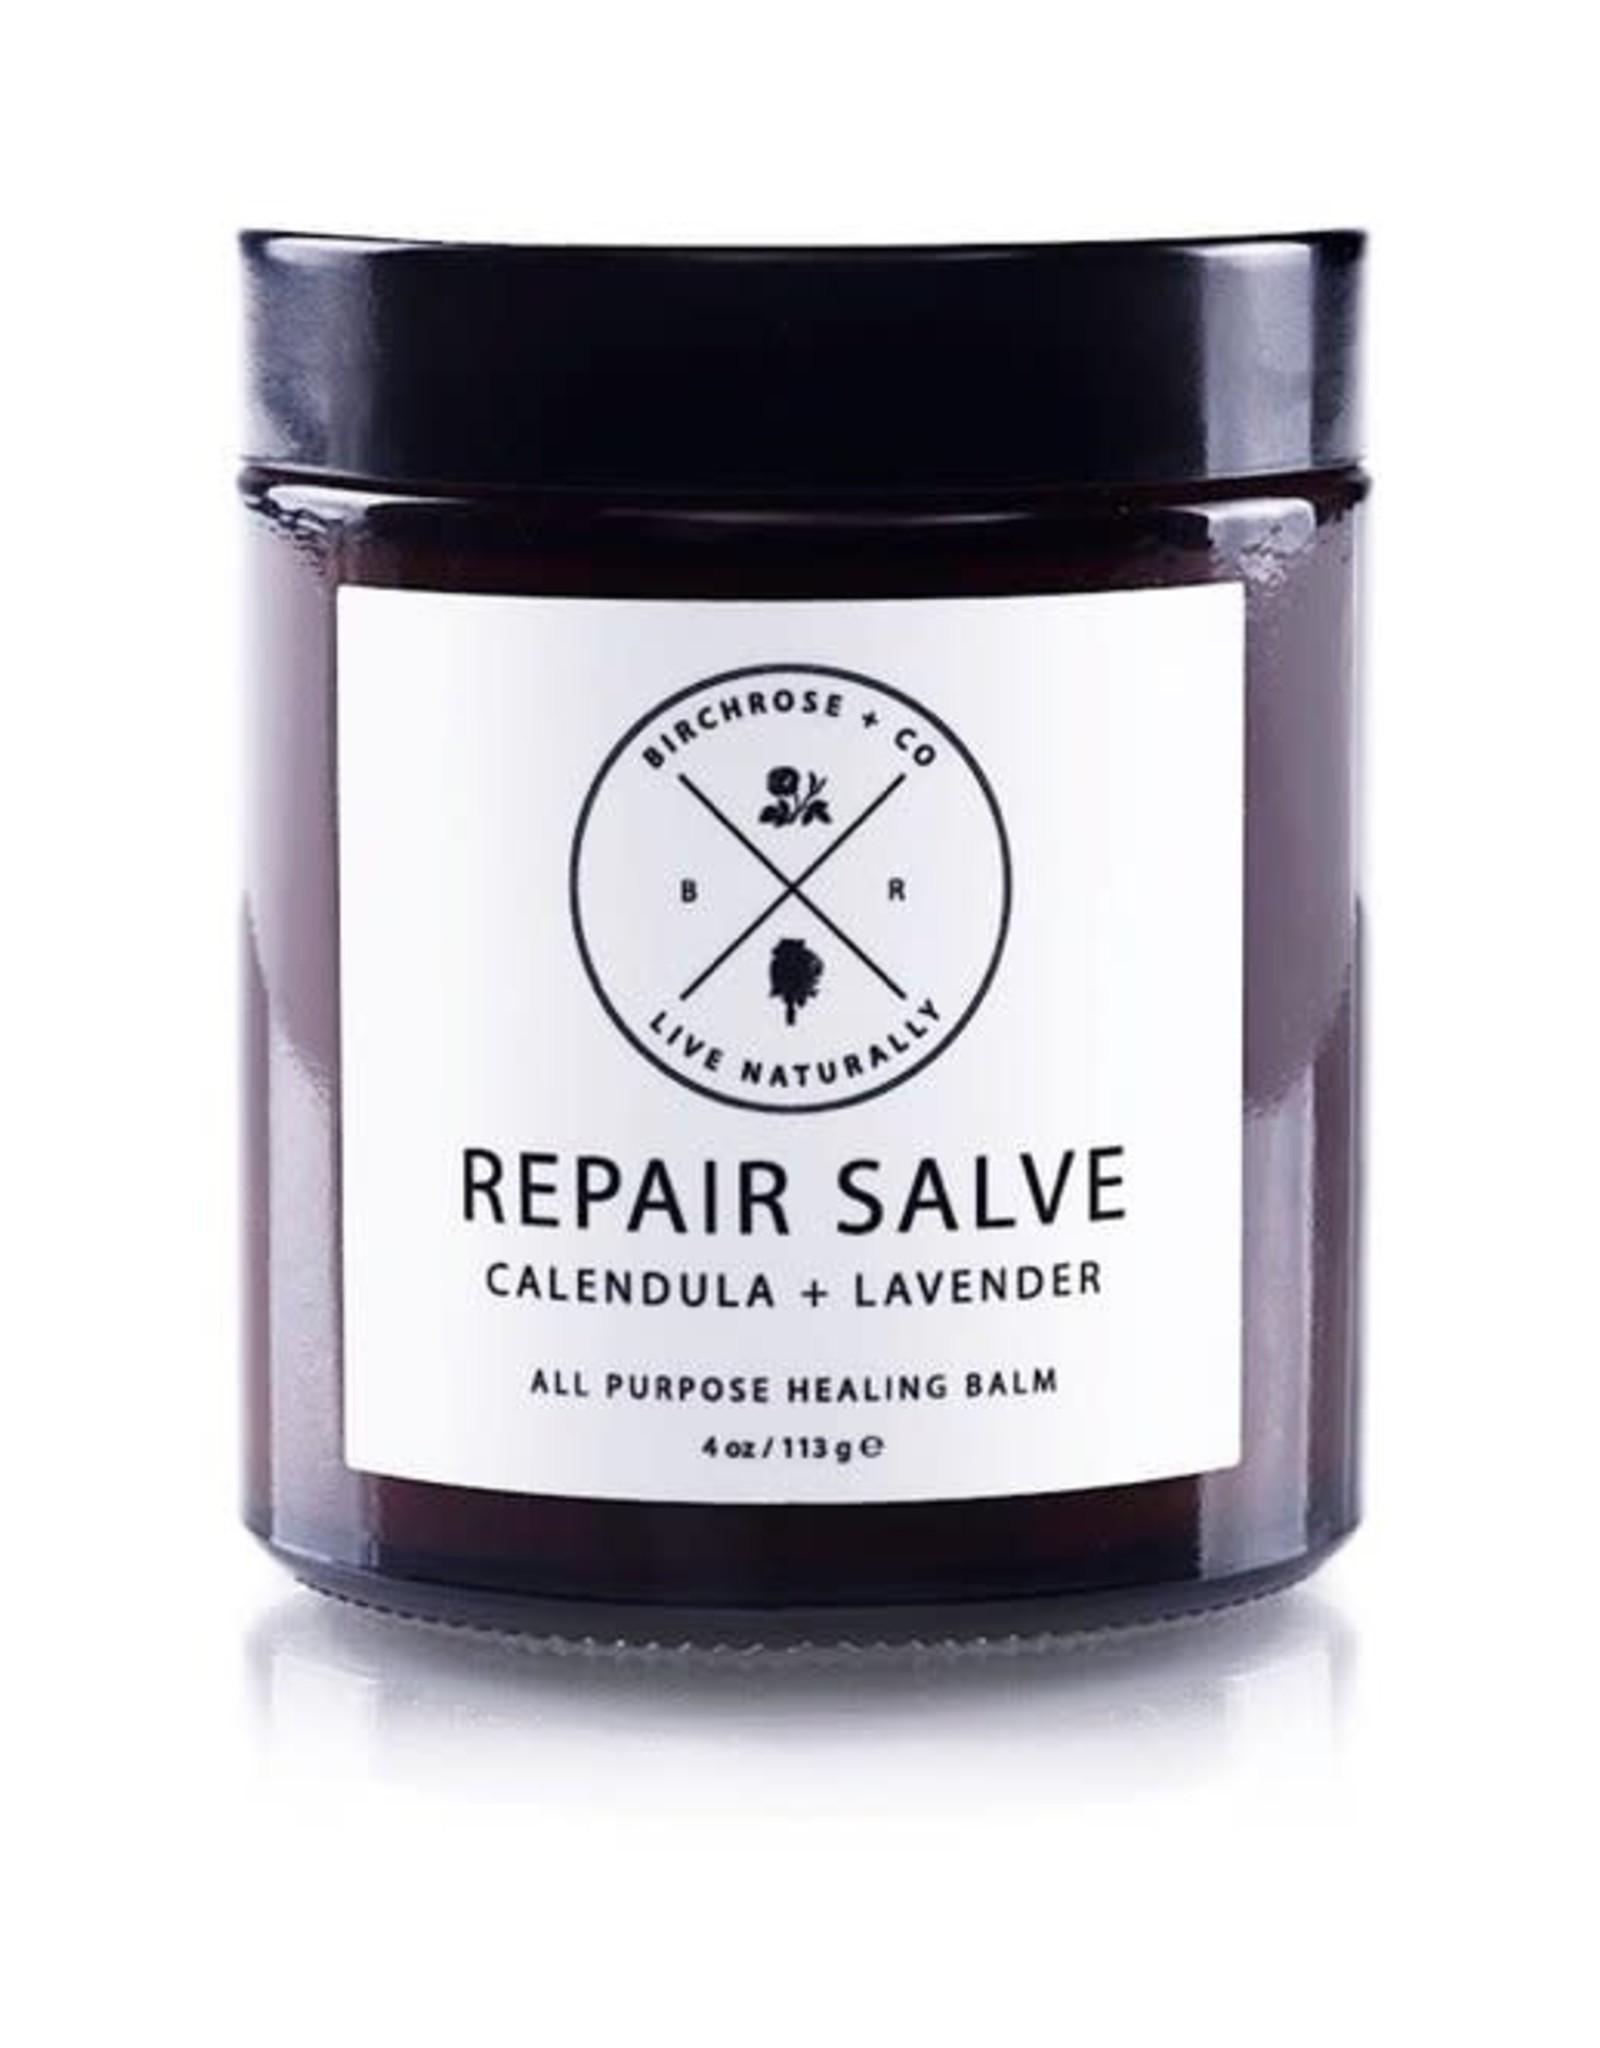 Birchrose & Co. Repair Salve